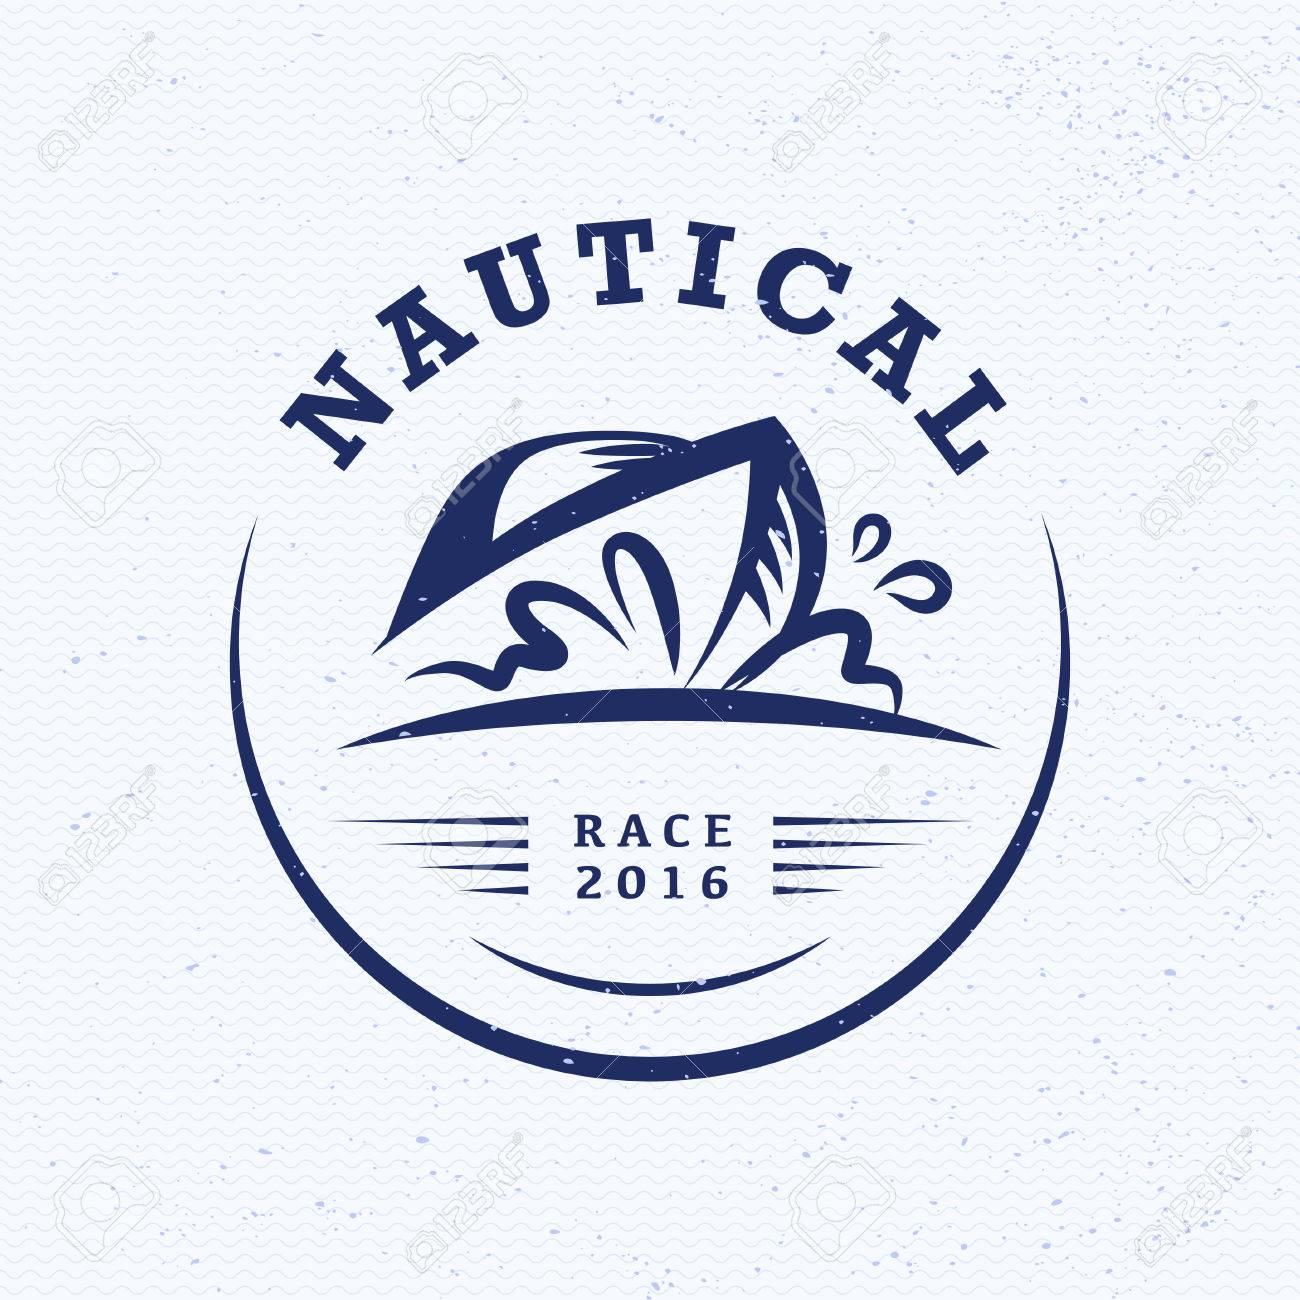 Vector Club Náutico Plana, Diseño Regata. Barco De Vela, Icono Nave ...